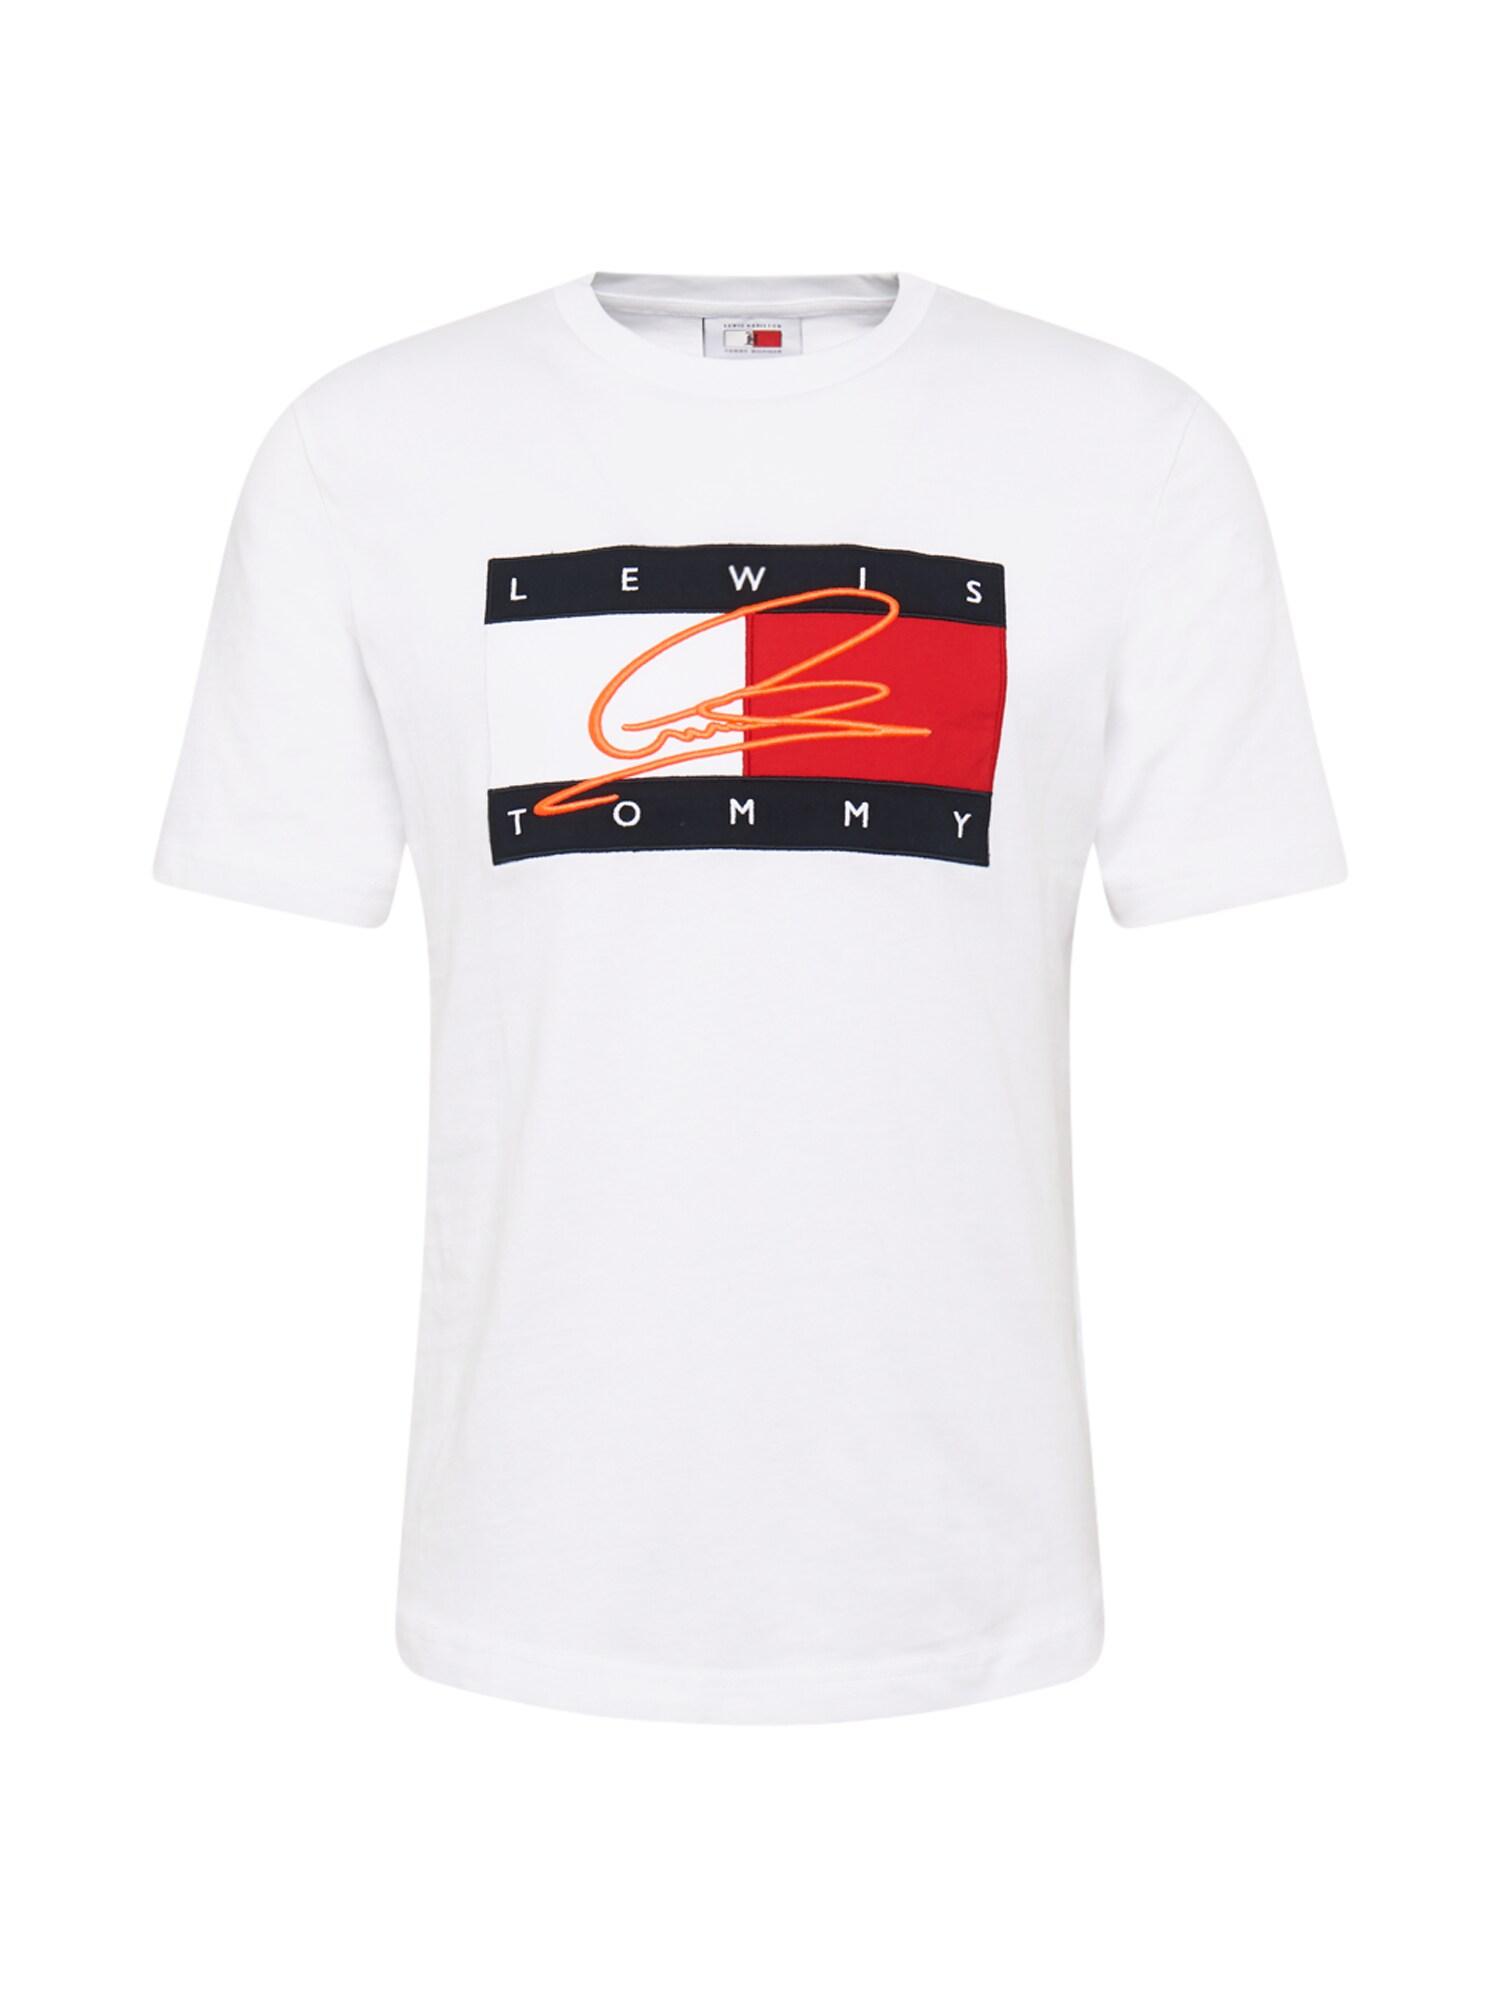 TOMMY HILFIGER Tričko  červené / biela / tmavomodrá